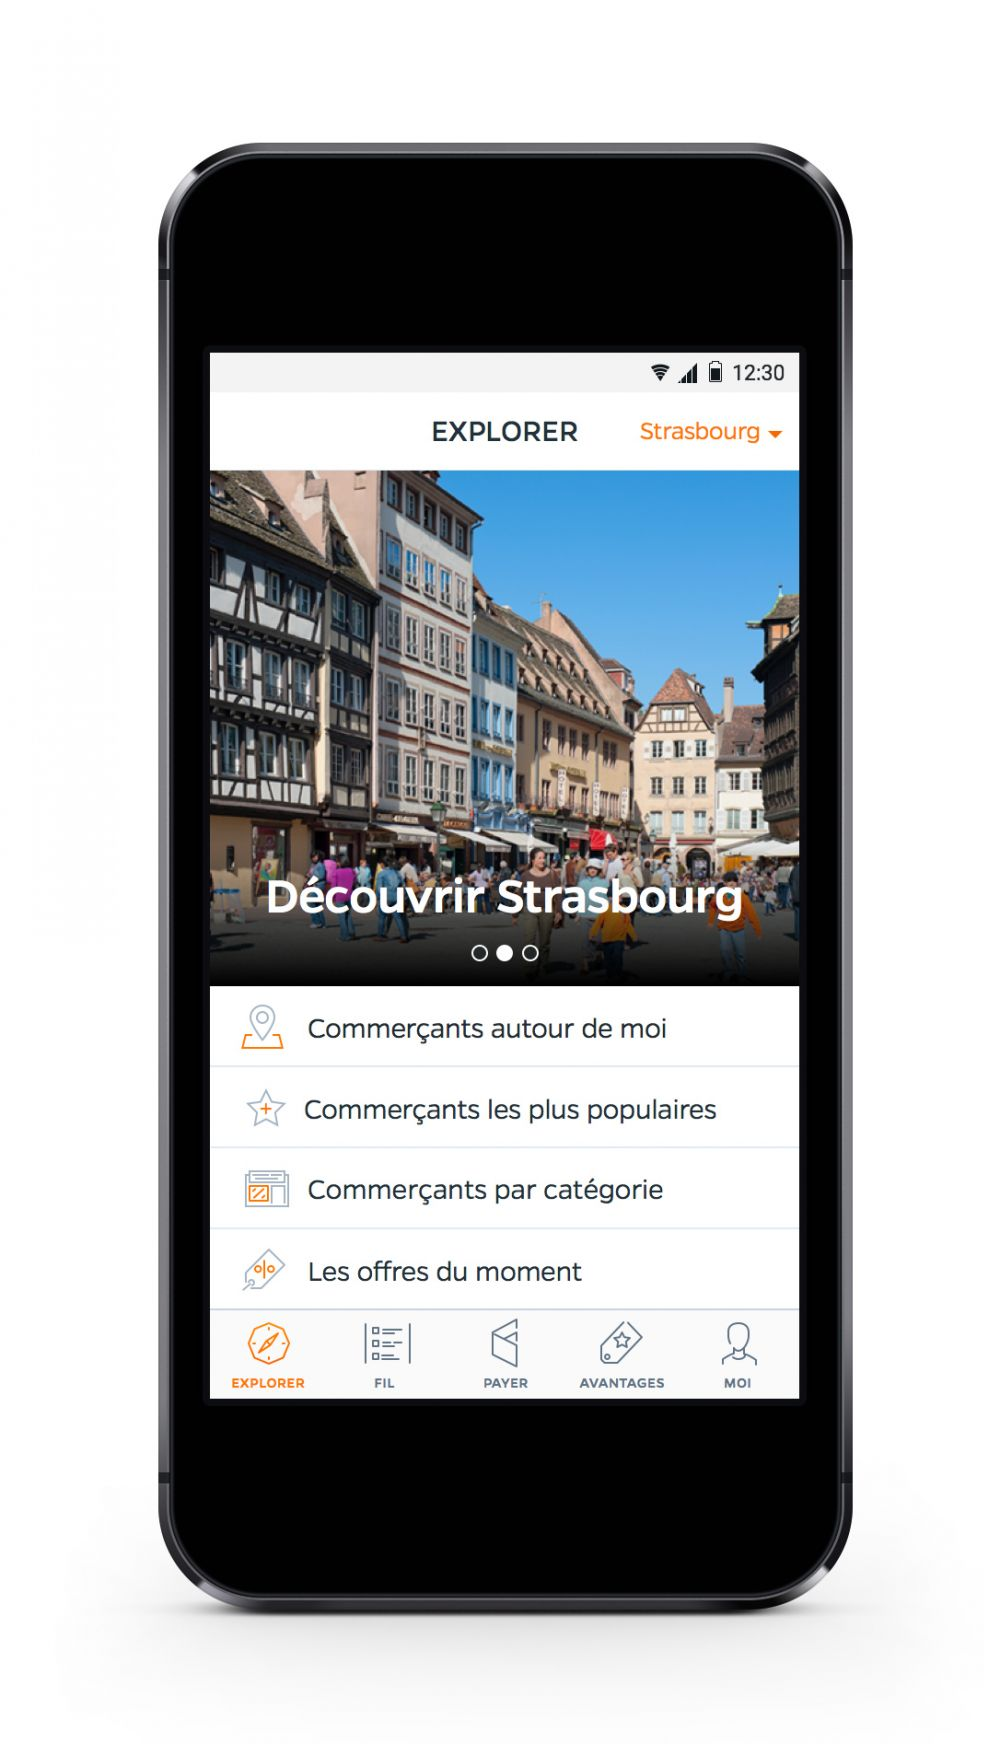 paiement mobile strasbourg application smartphone r ductions point eco alsace. Black Bedroom Furniture Sets. Home Design Ideas